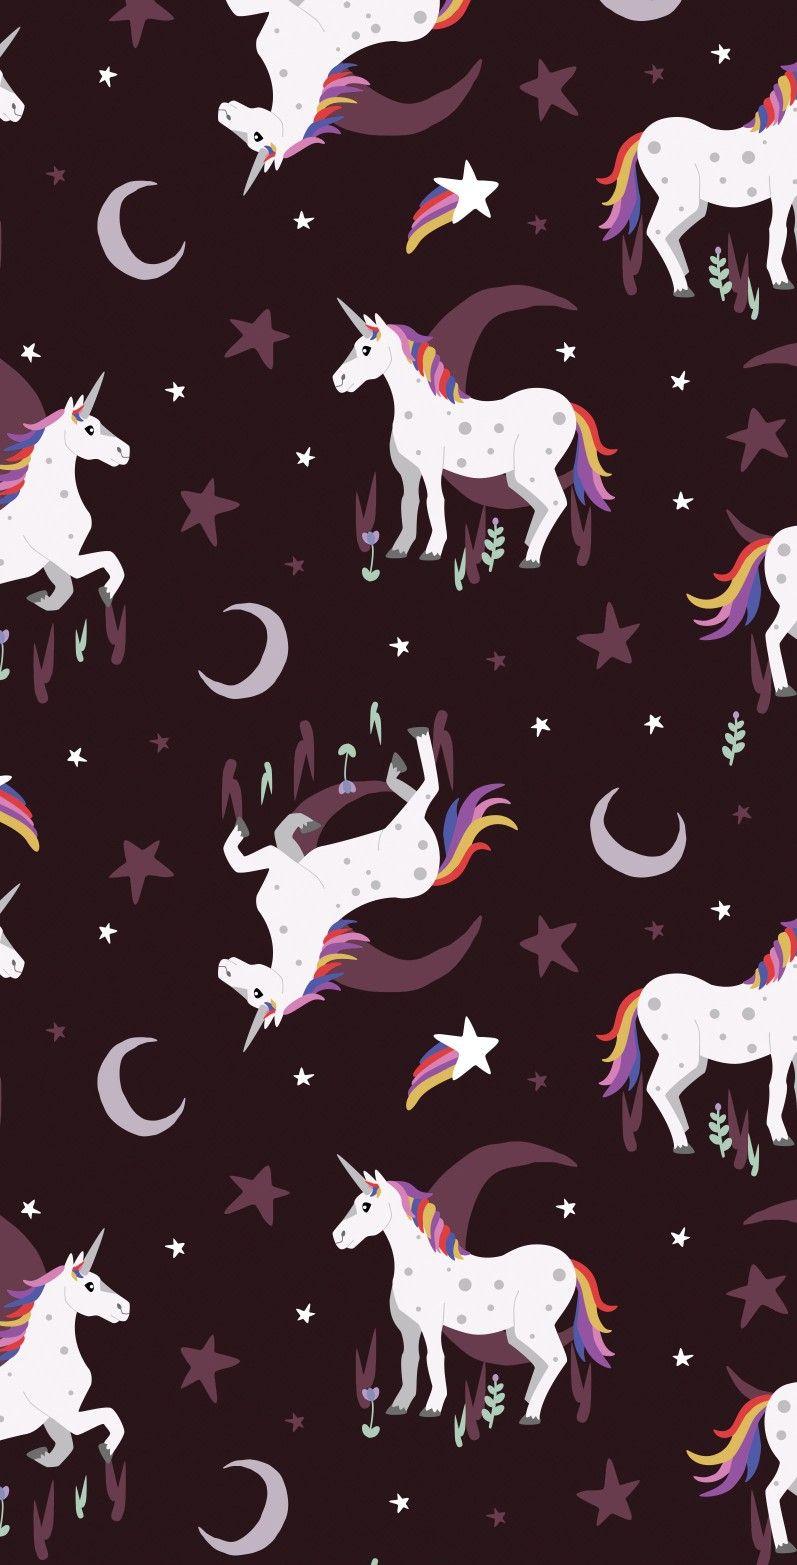 Unicorn And Rainbow Fondo De Pantalla Unicornio Dibujos Bonitos